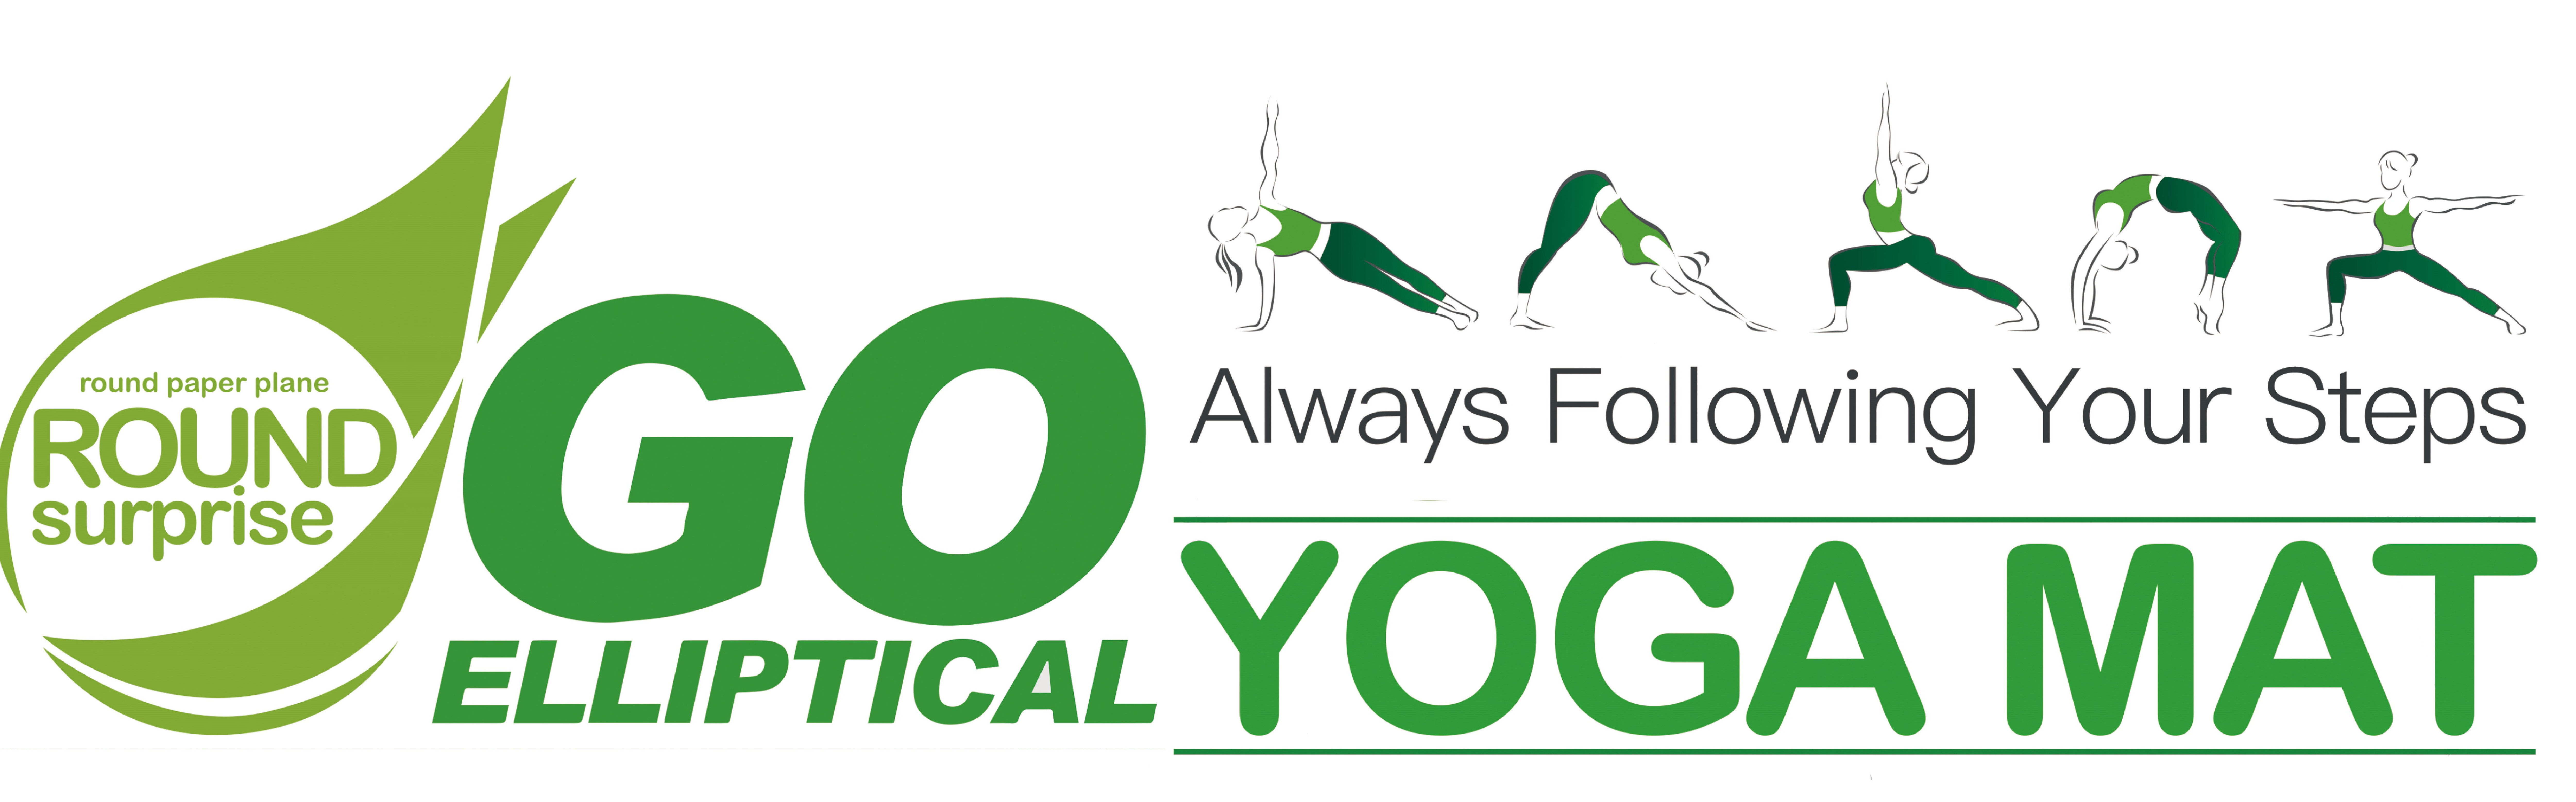 Yogamat01